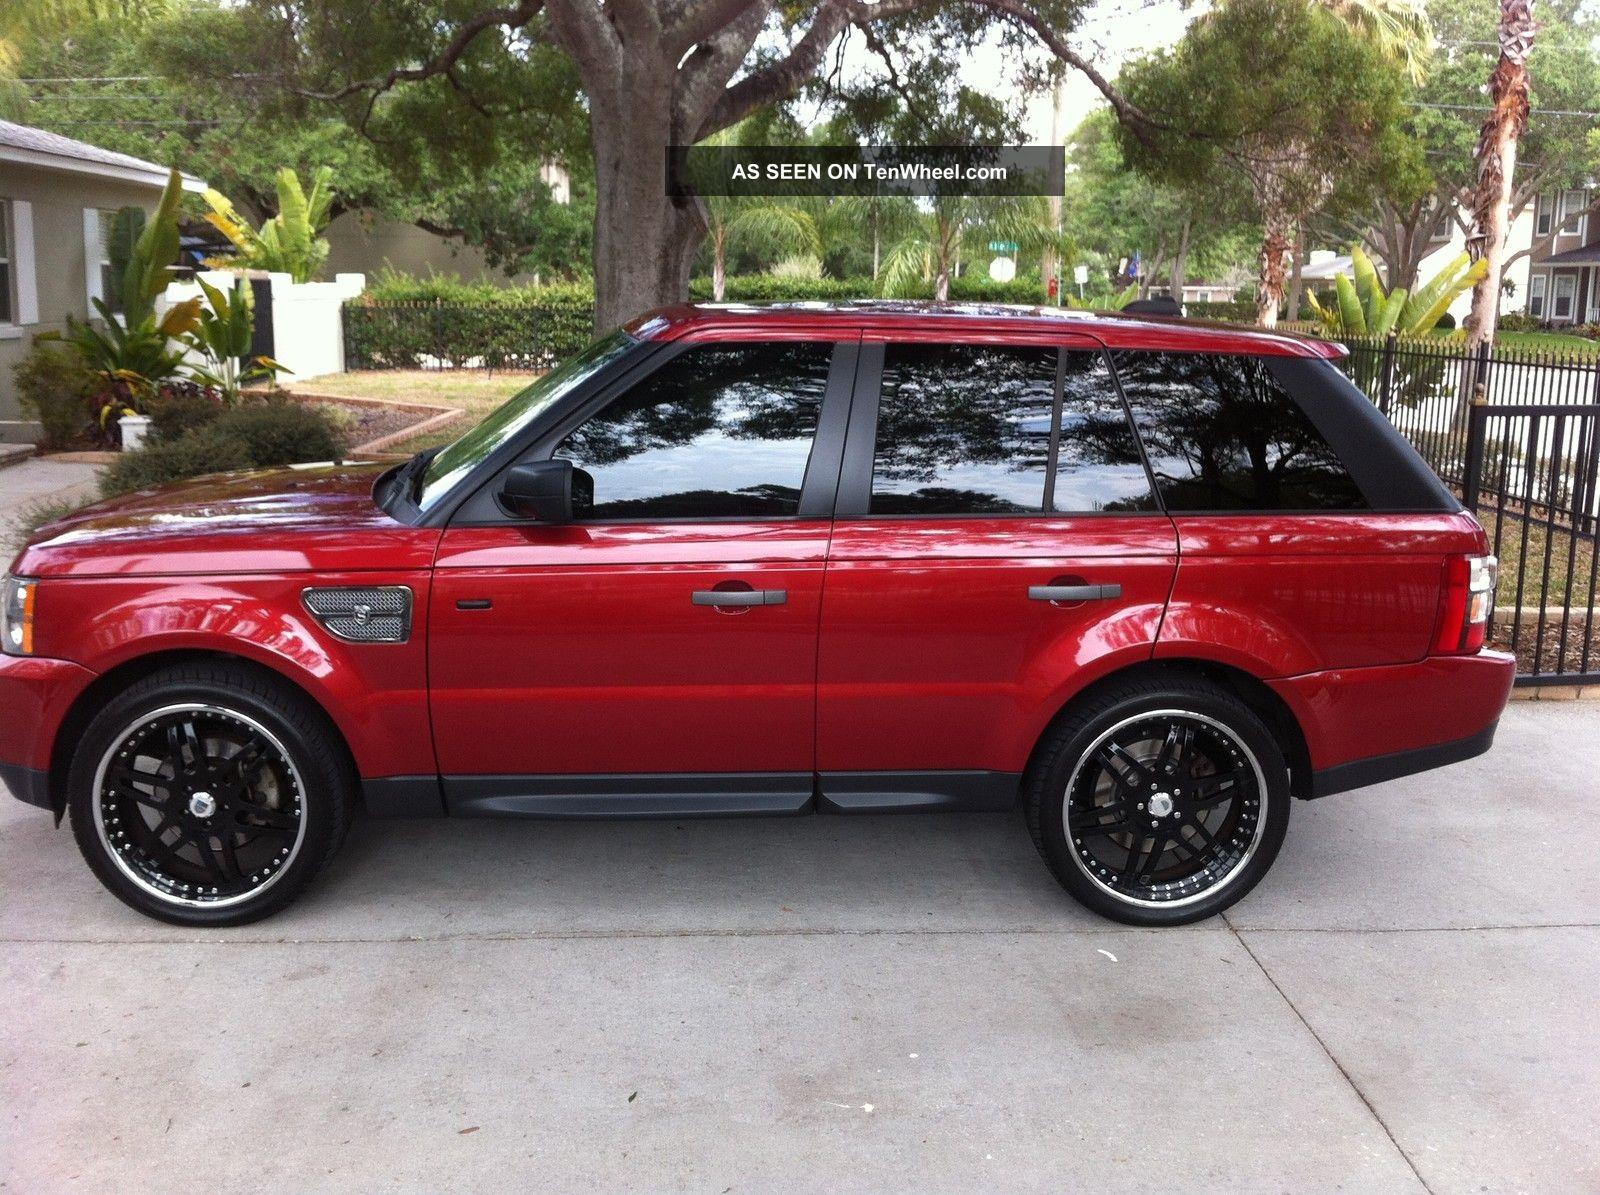 2006 Range Rover Sport Strut Edition.  Loaded.  Rimini Red / Charcoal.  22